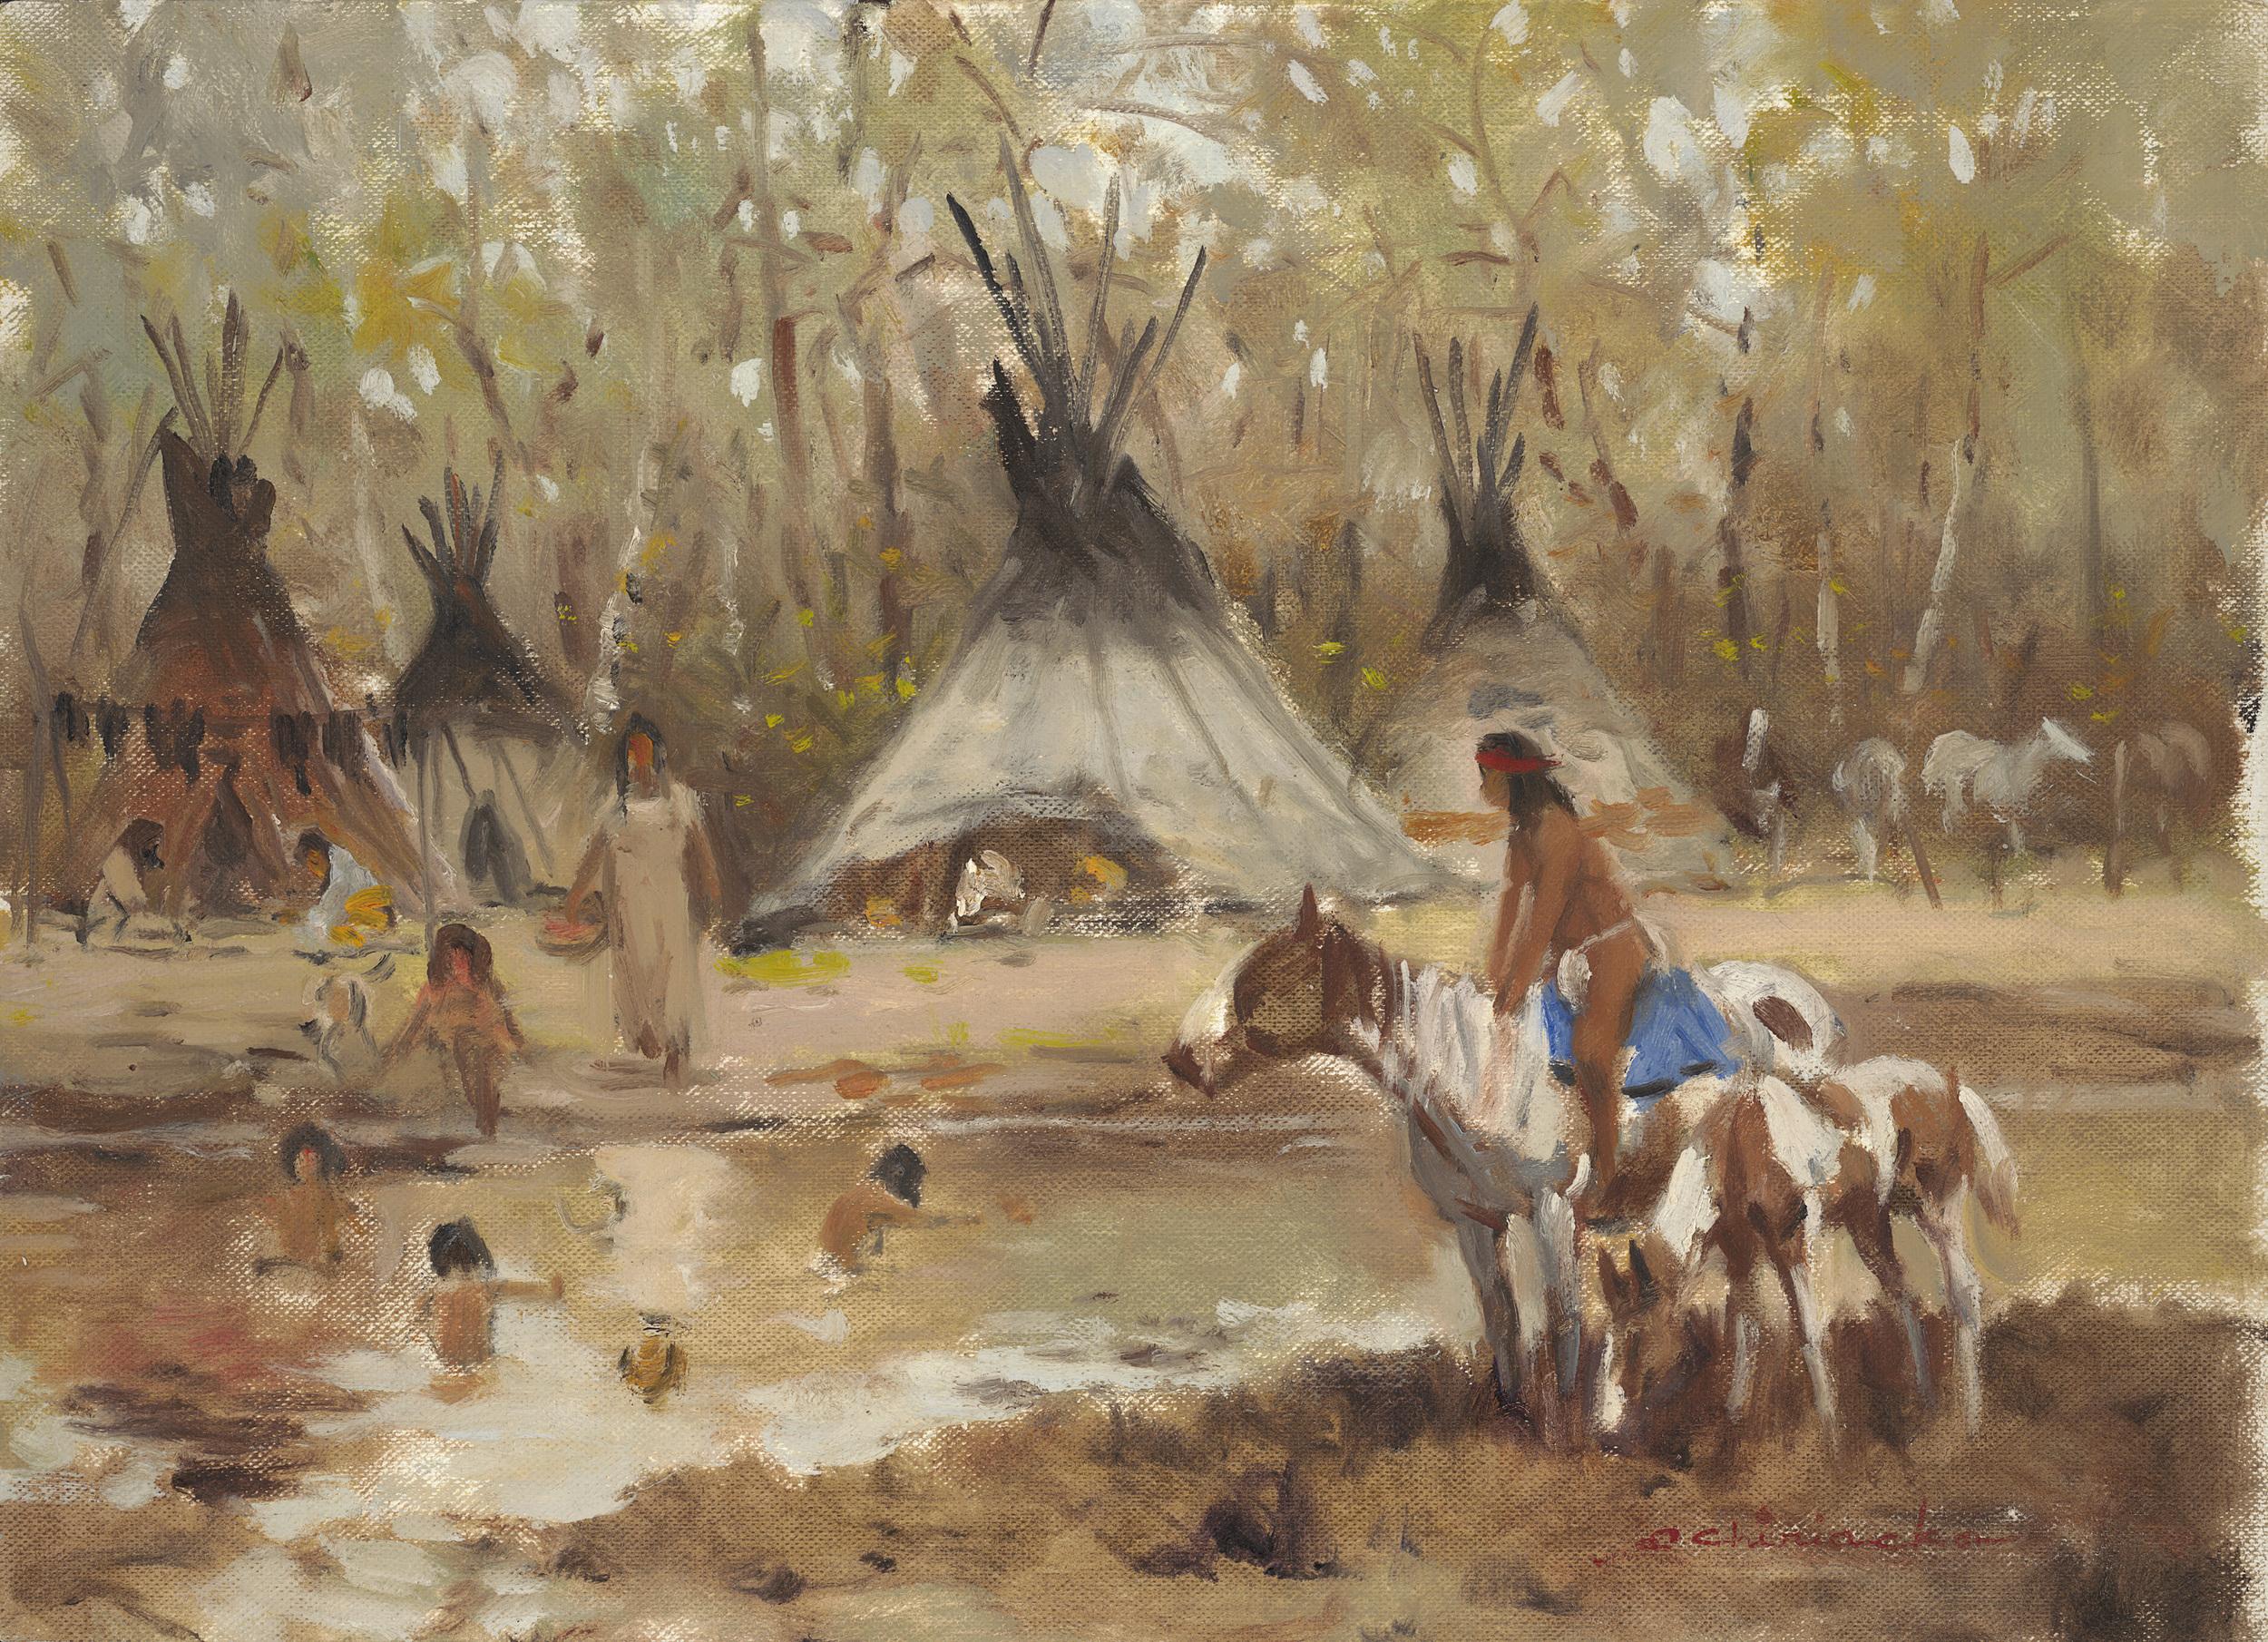 Sioux Camp